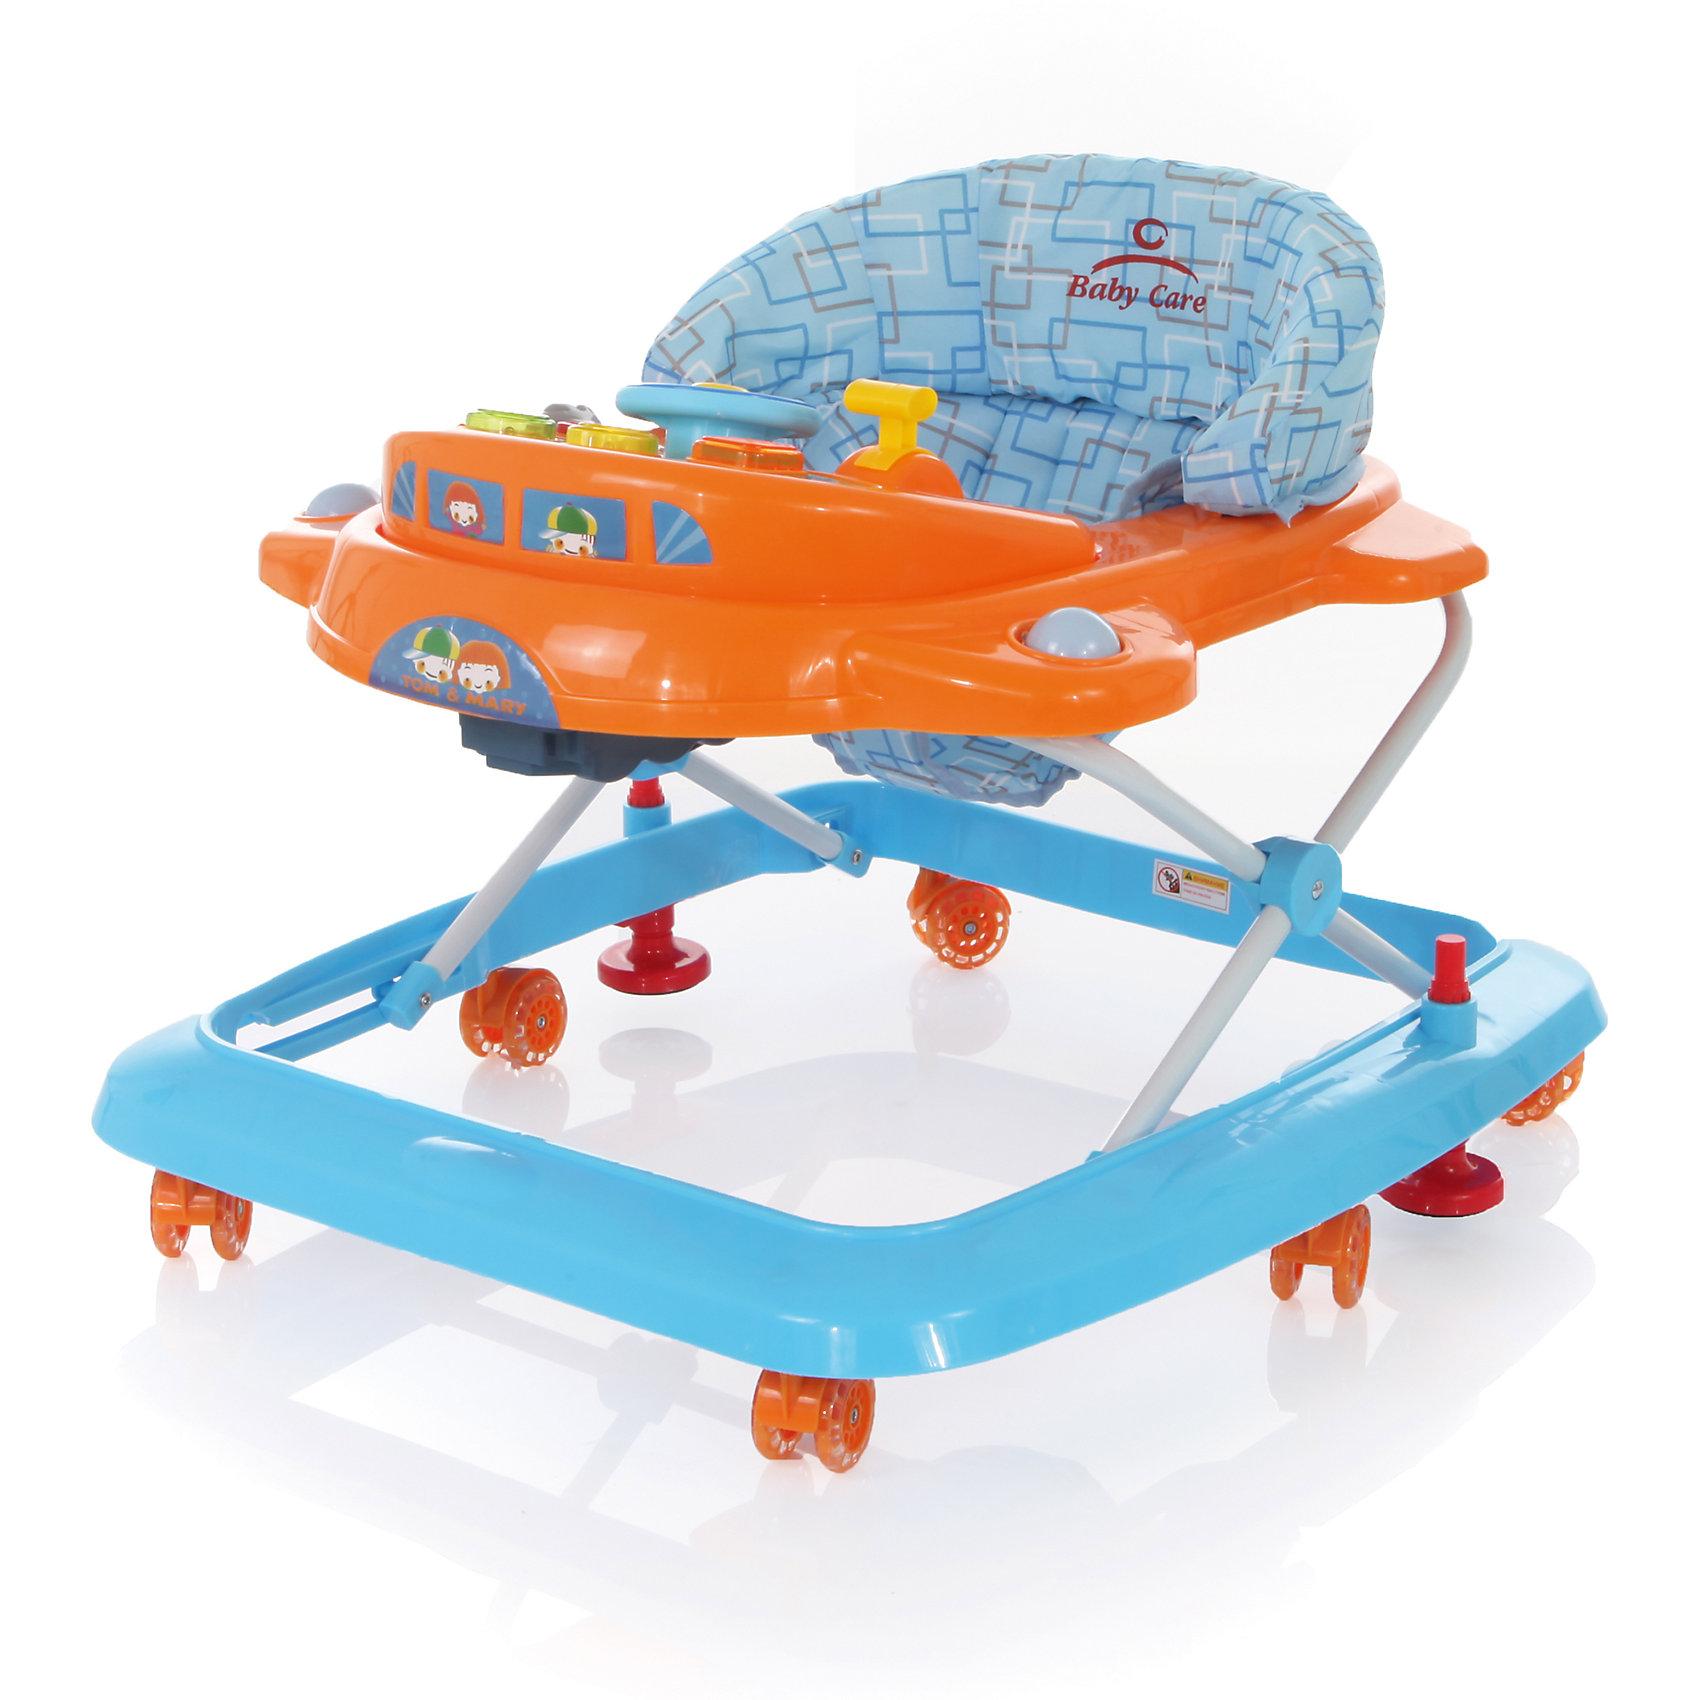 Baby Care Ходунки Tom&Mary, Baby Care, голубой/оранжевый happy baby ходунки smiley v2 цвет голубой